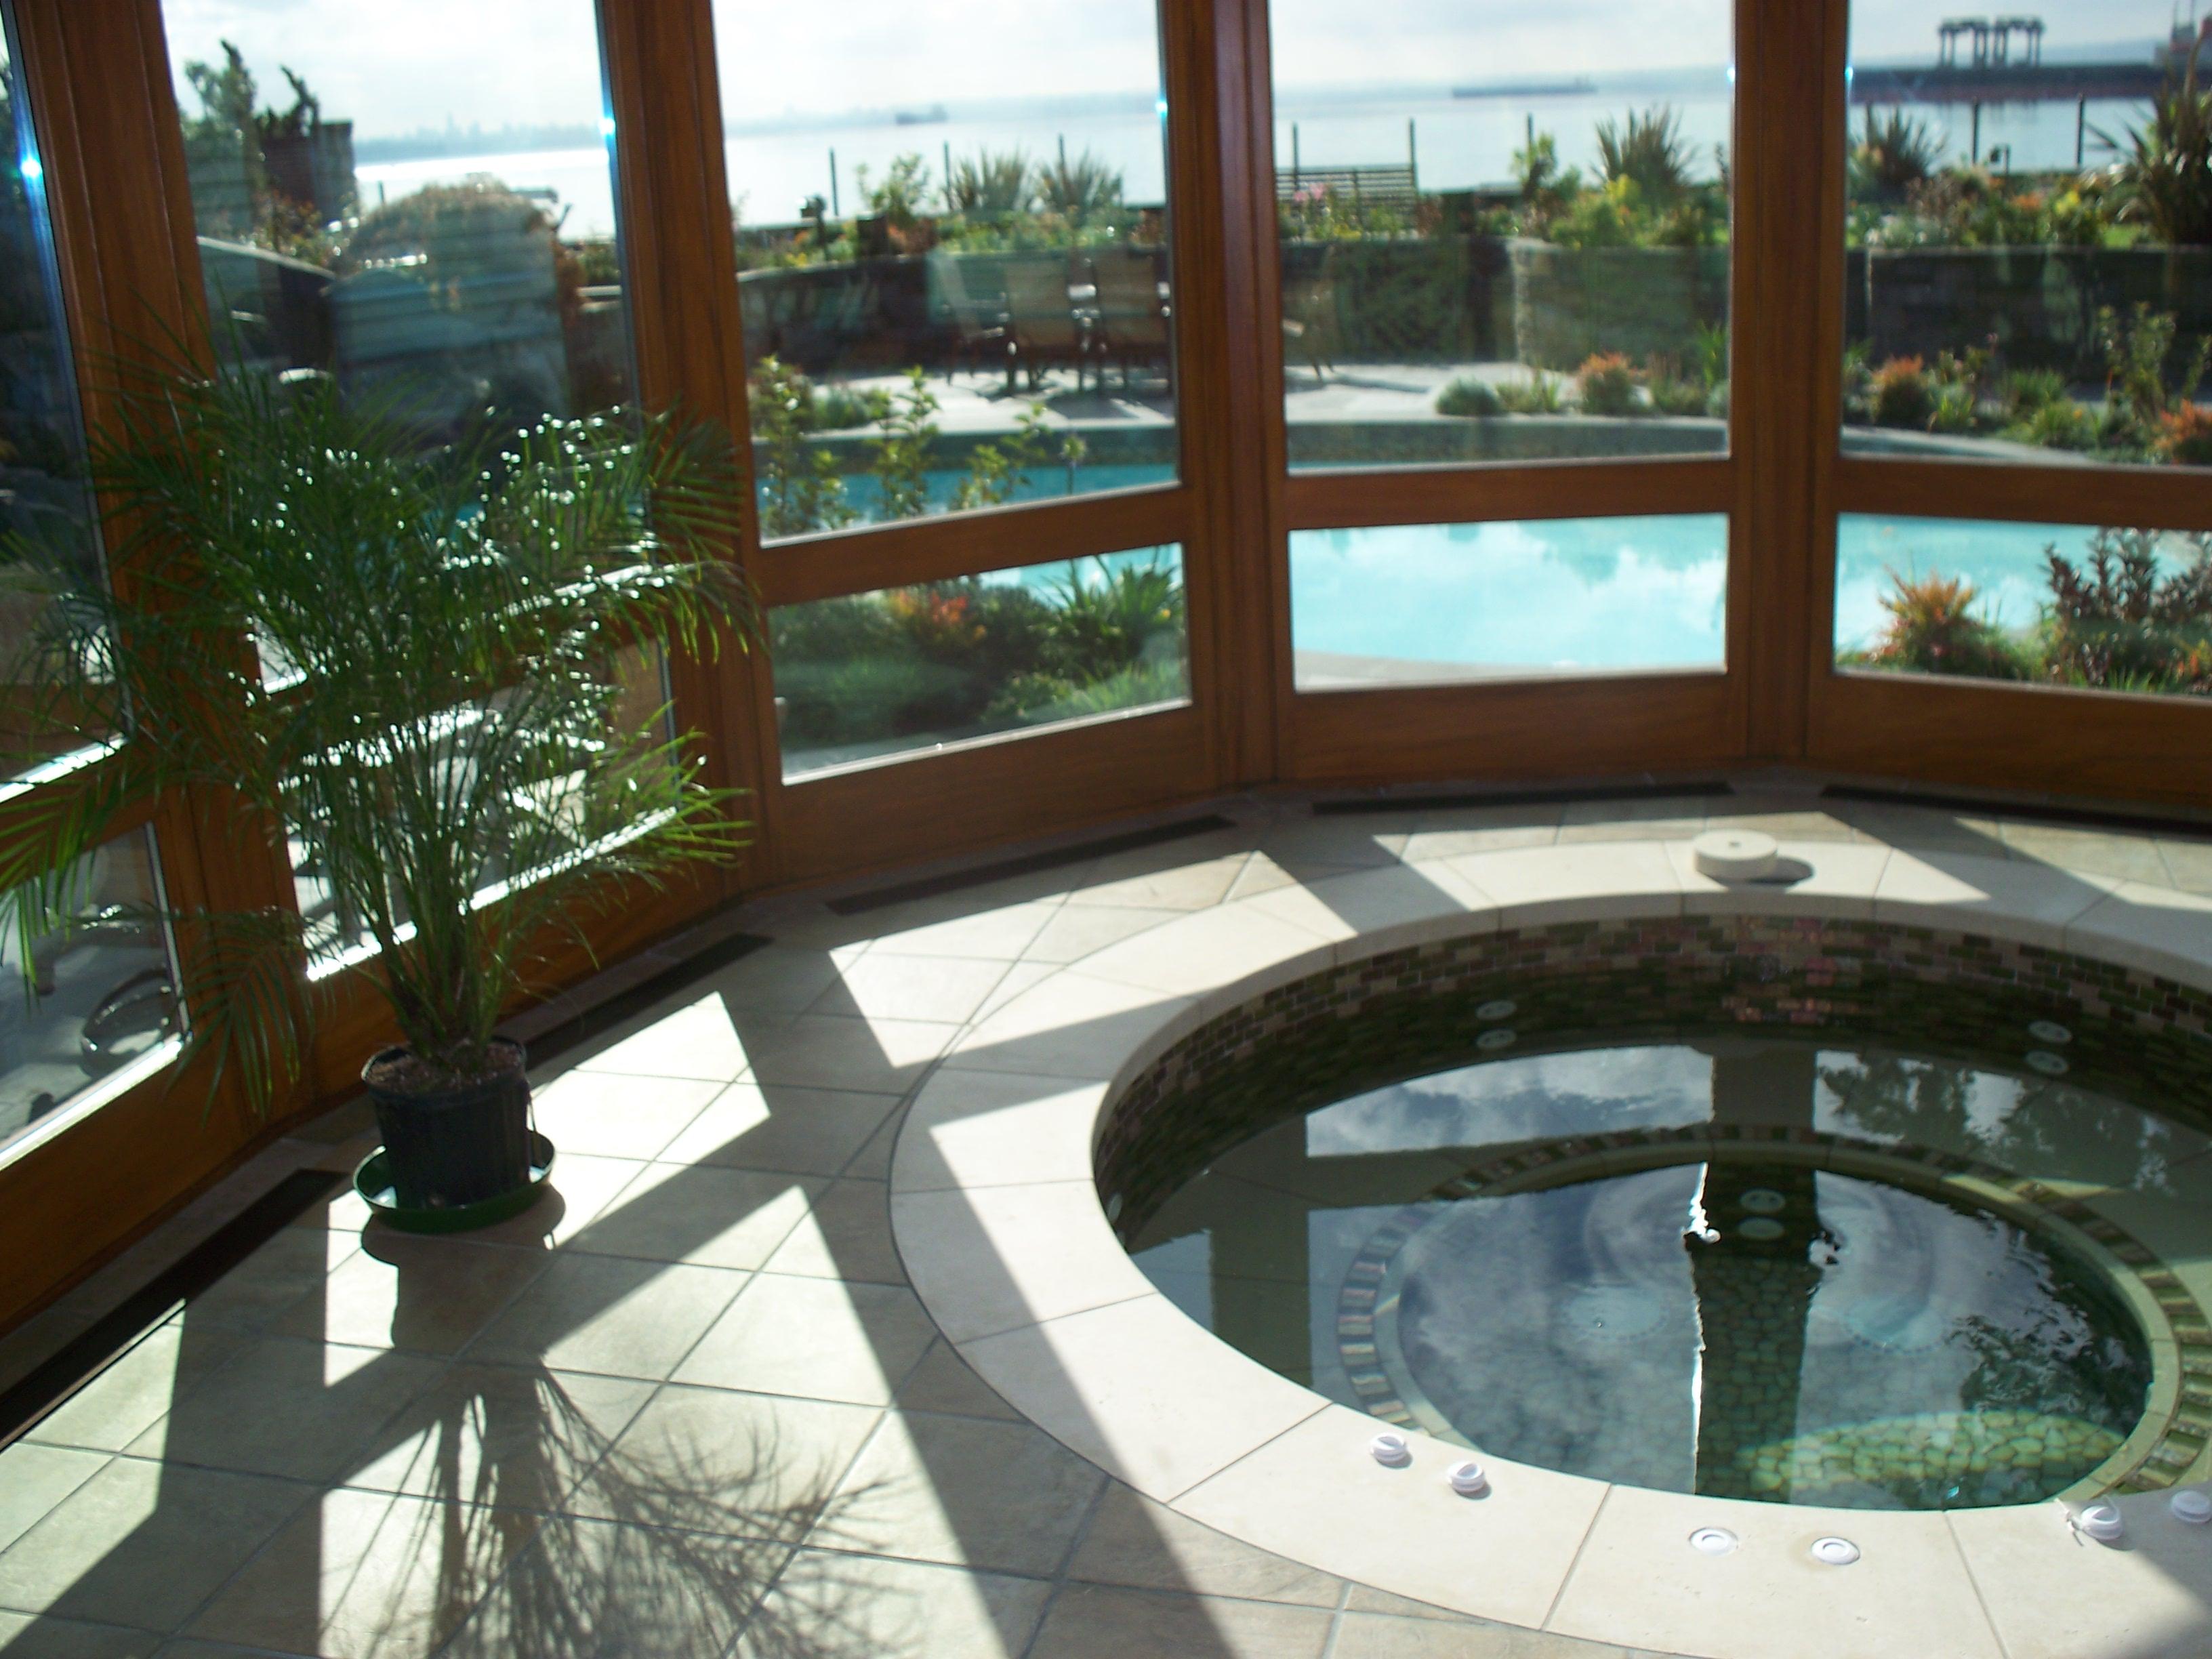 astonishing good hot arctic best spas ideas amazing manual tubs nice tub size full of